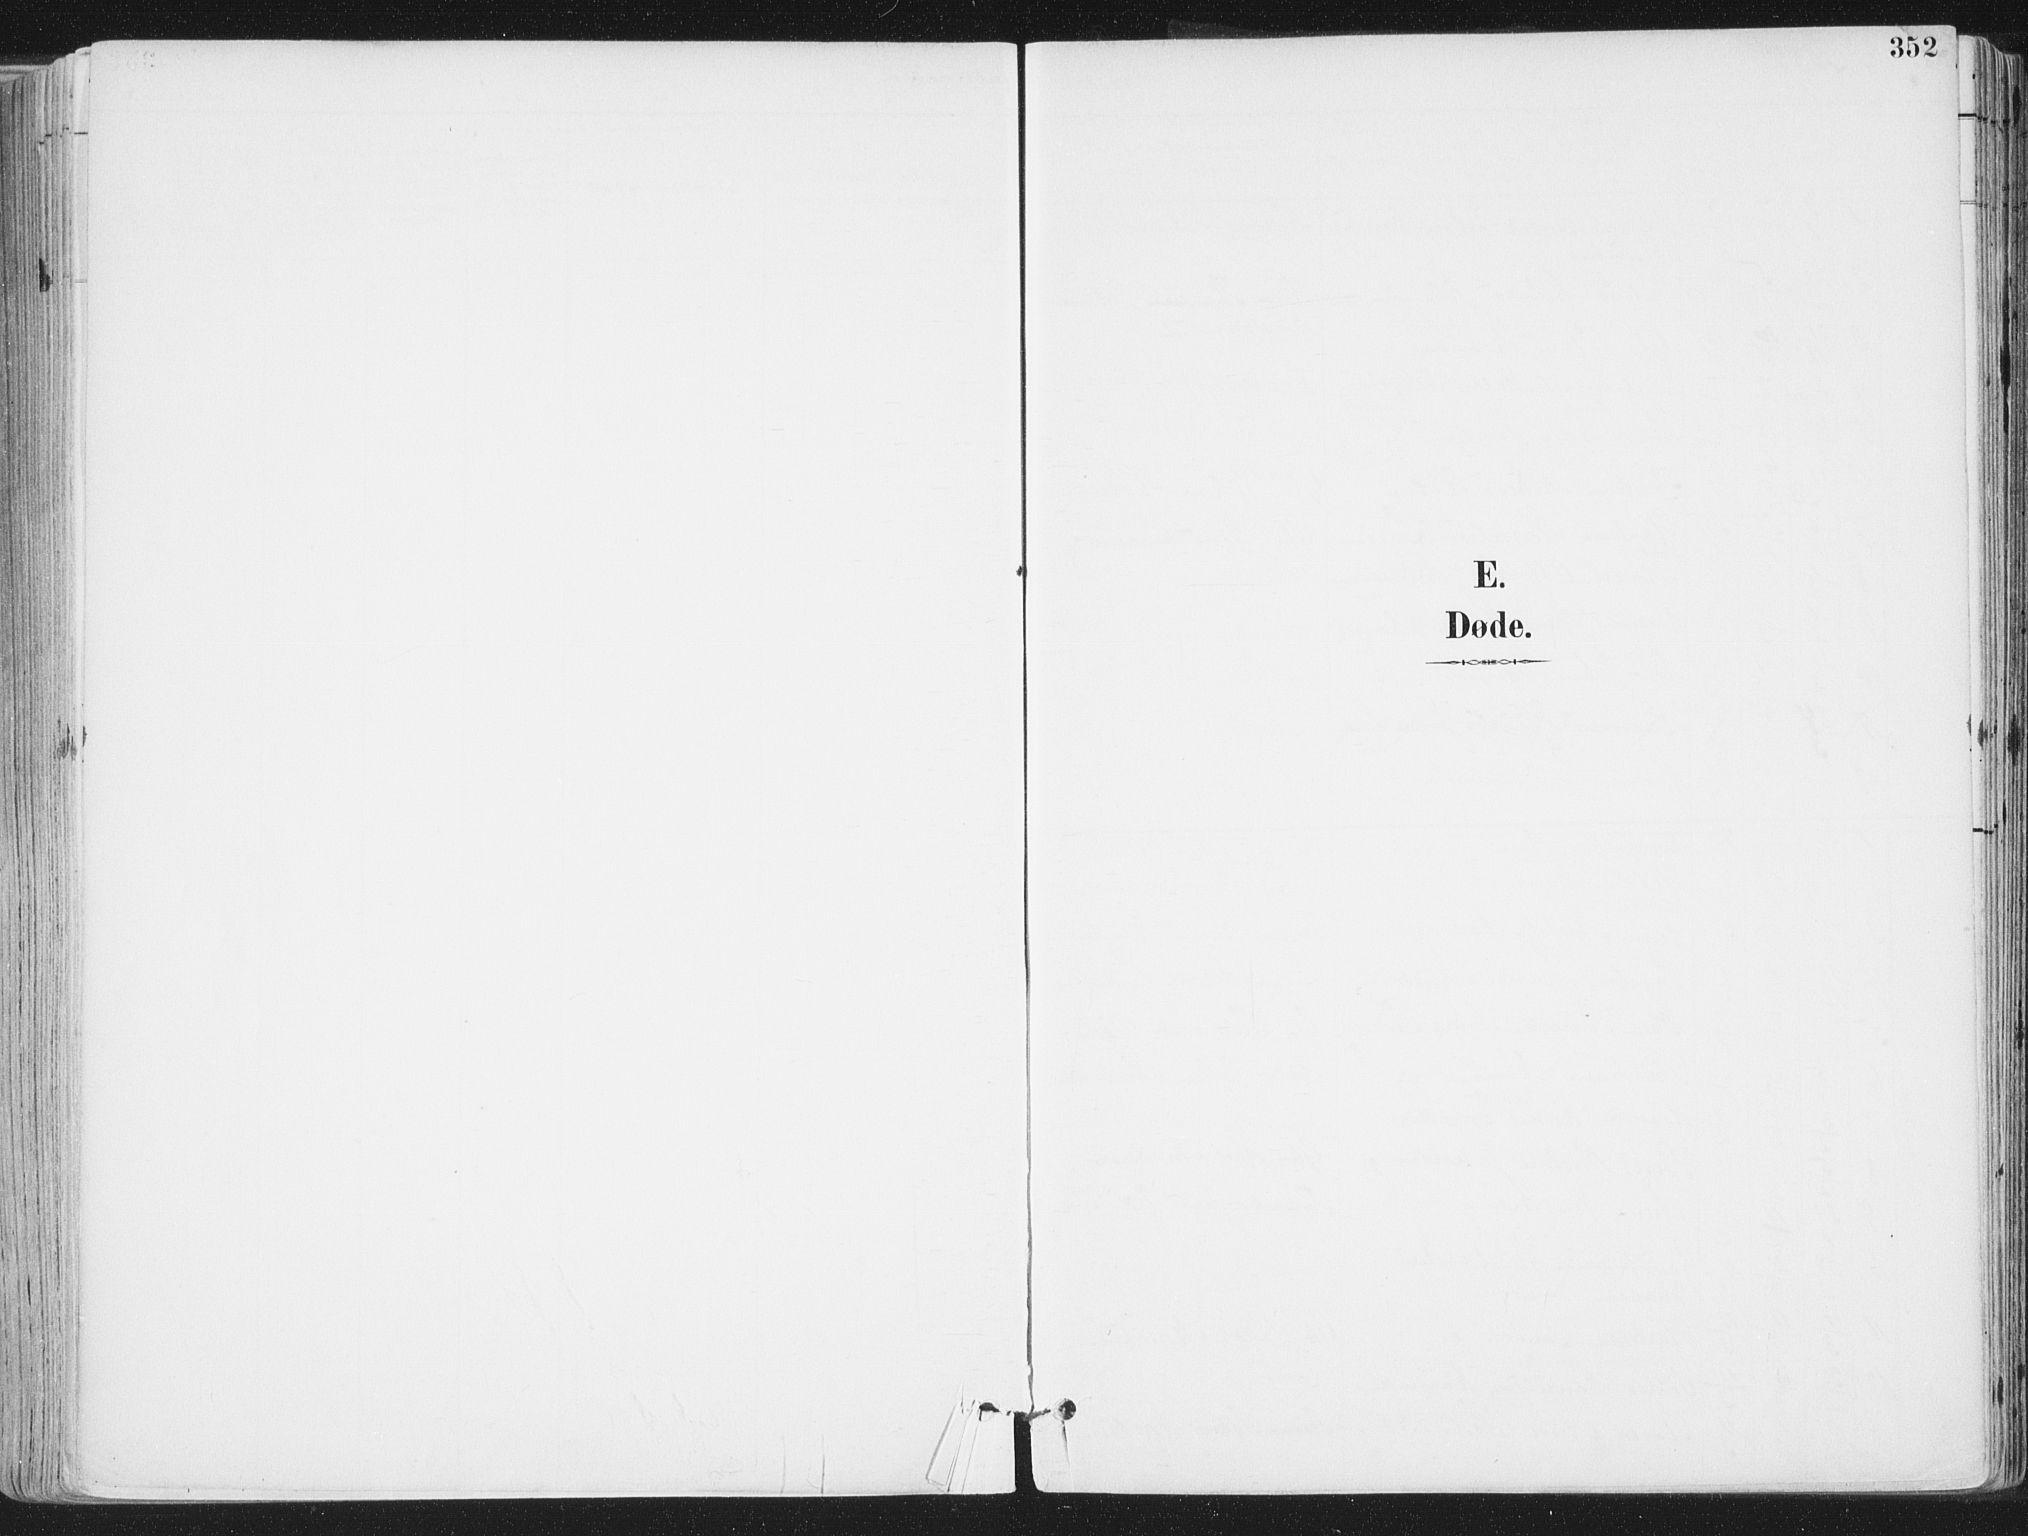 SAT, Ministerialprotokoller, klokkerbøker og fødselsregistre - Nordland, 802/L0055: Ministerialbok nr. 802A02, 1894-1915, s. 352